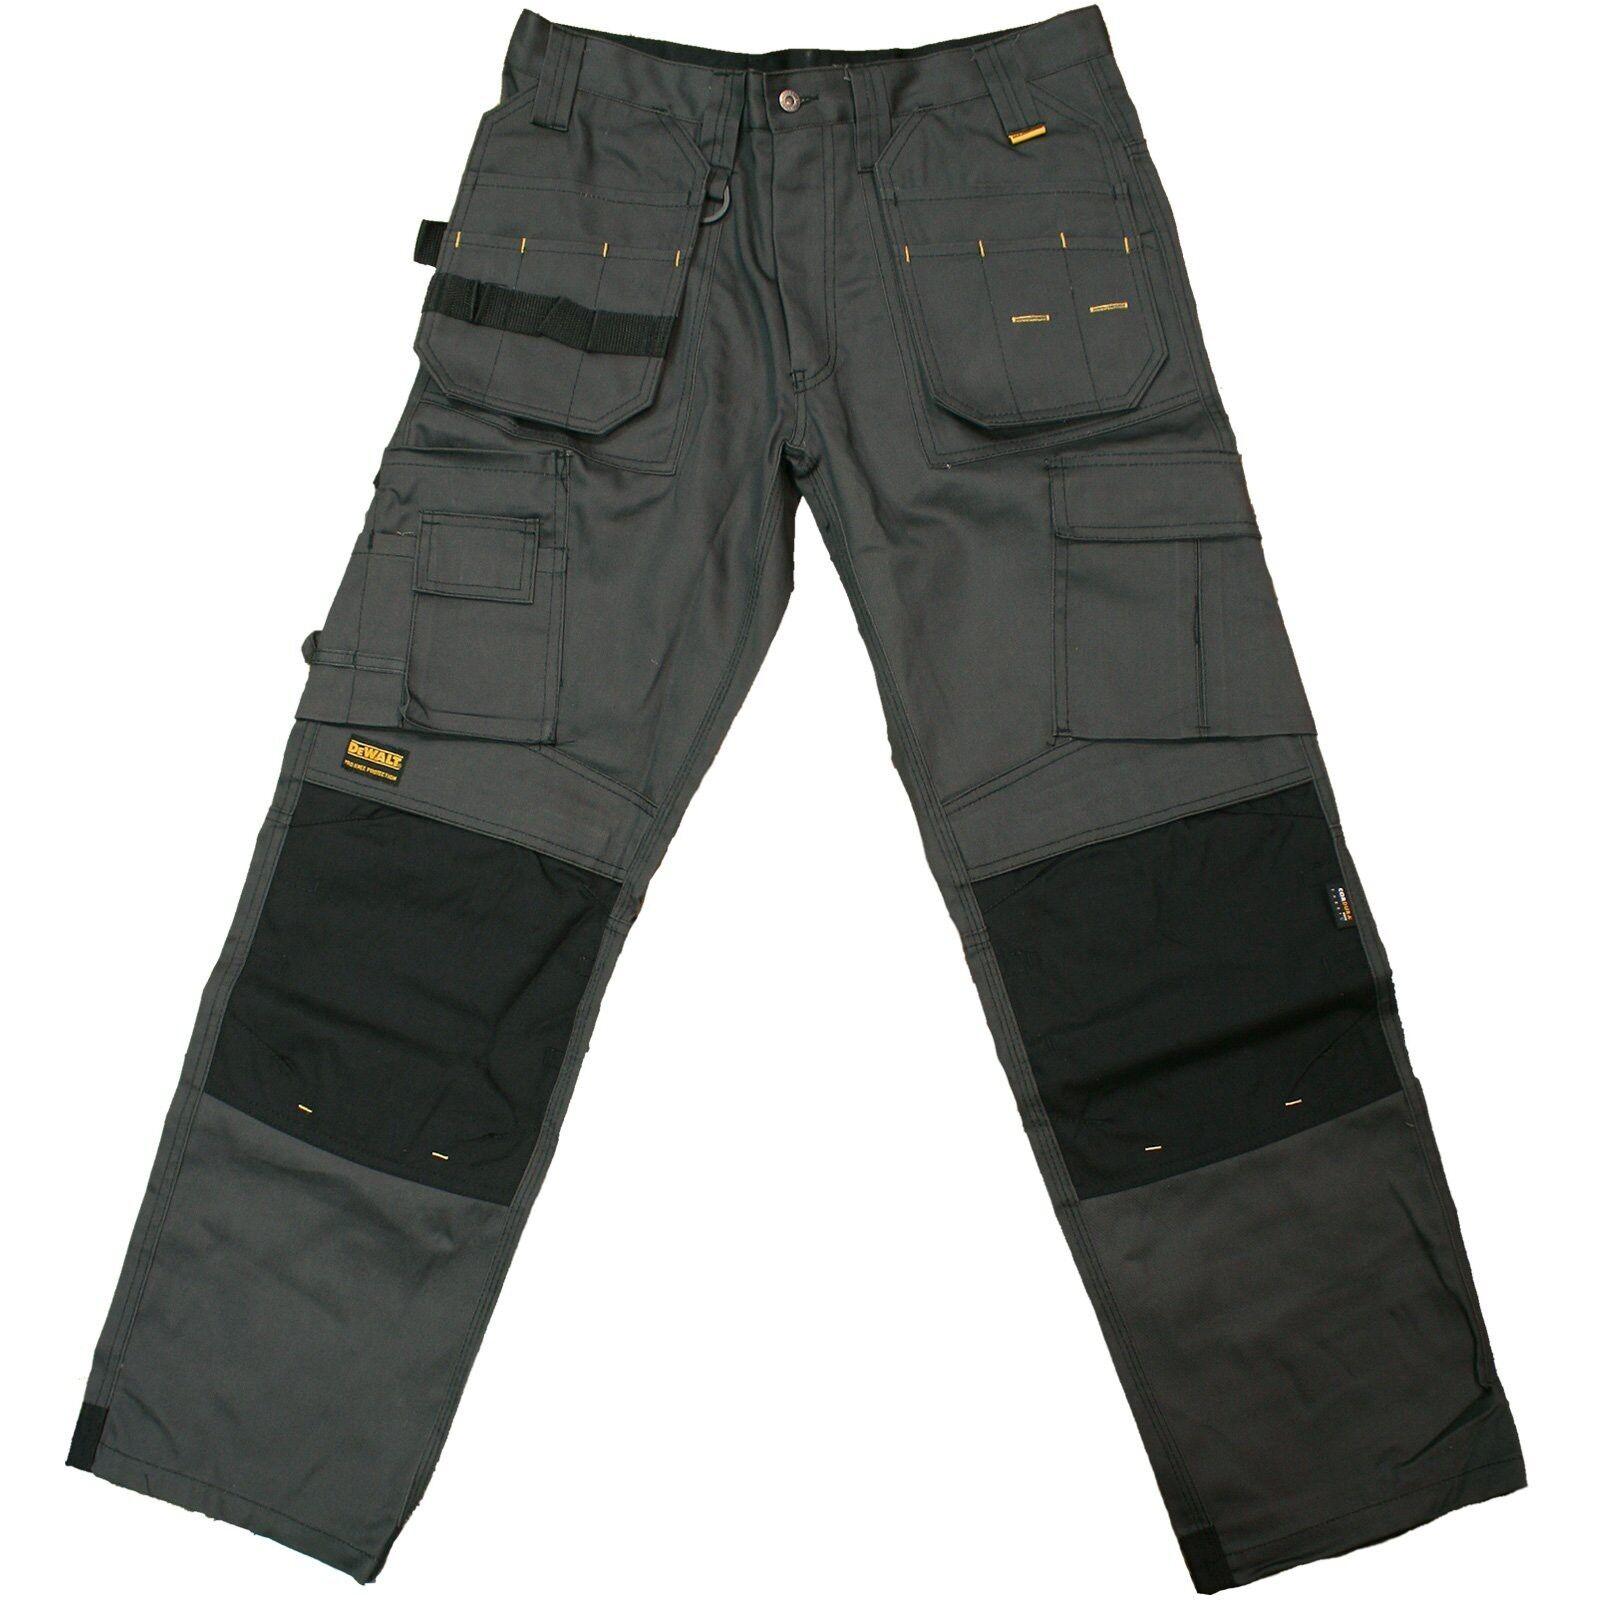 Dewalt PRO TRADESMAN grau 34 33 Trousers, 34 Waist/33 Length, Grau